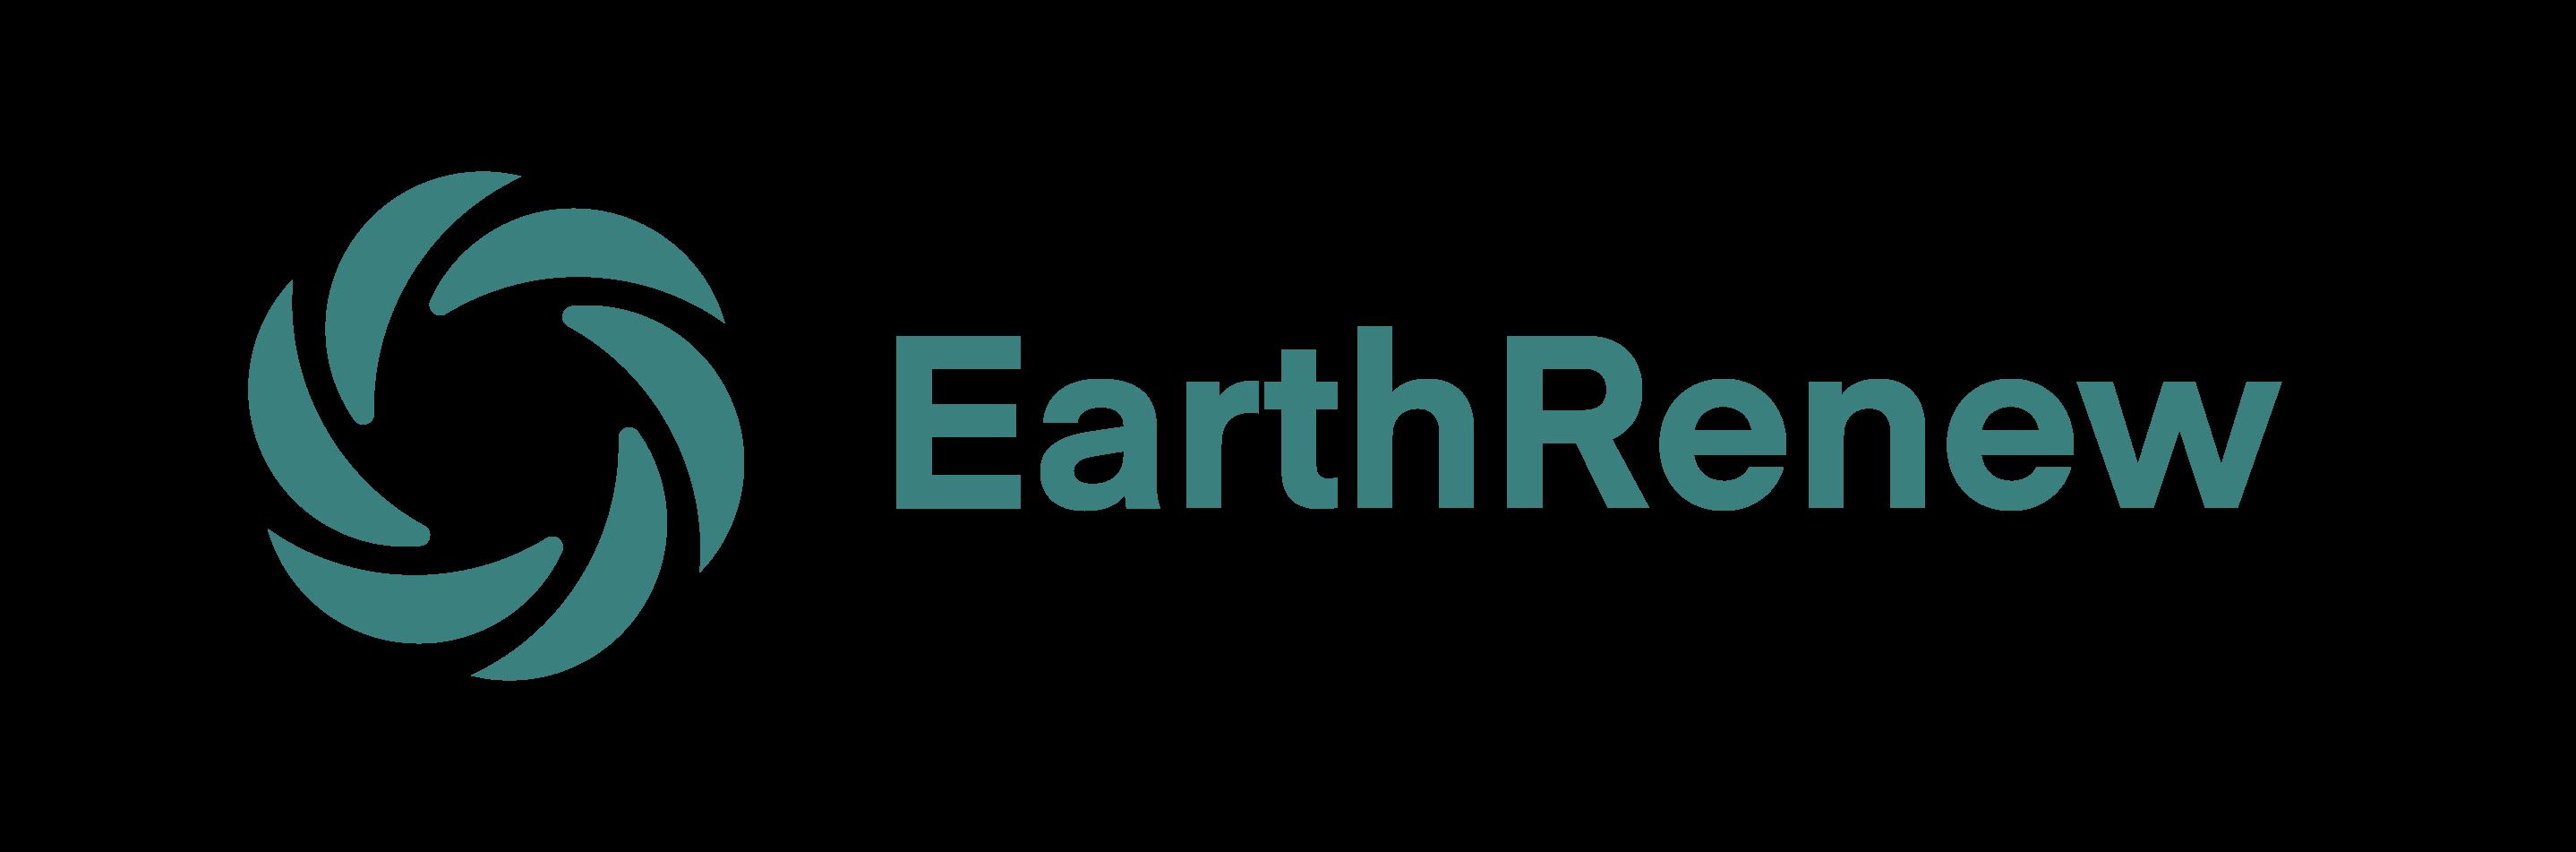 EarthRenew Grants Stock Options